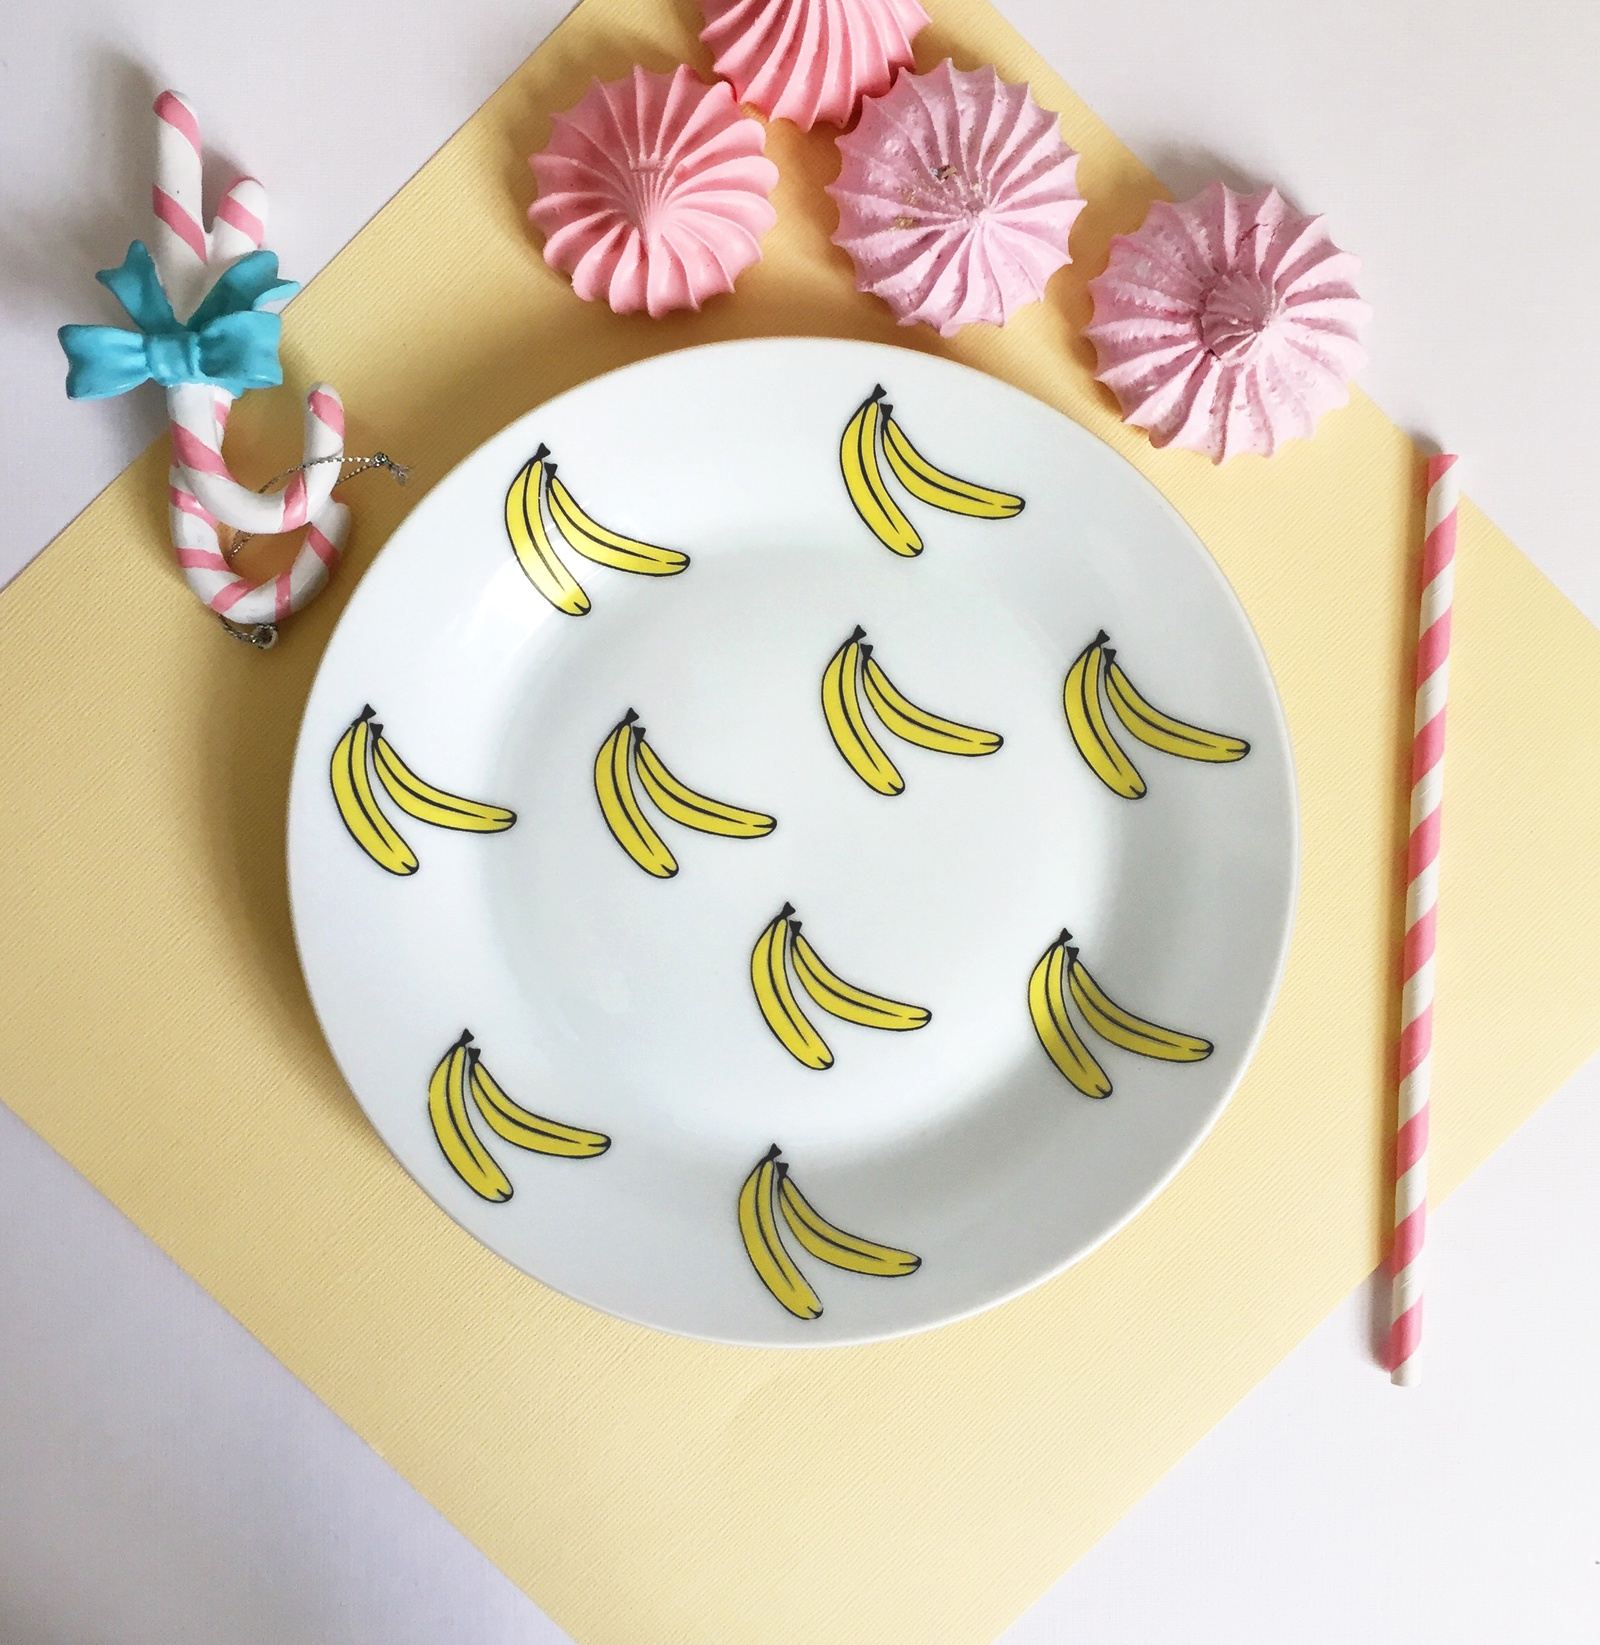 Тарелка Сотвори Чудо Бананы 20 см, белый тарелка мелкая сотвори чудо бананы диаметр 20 см